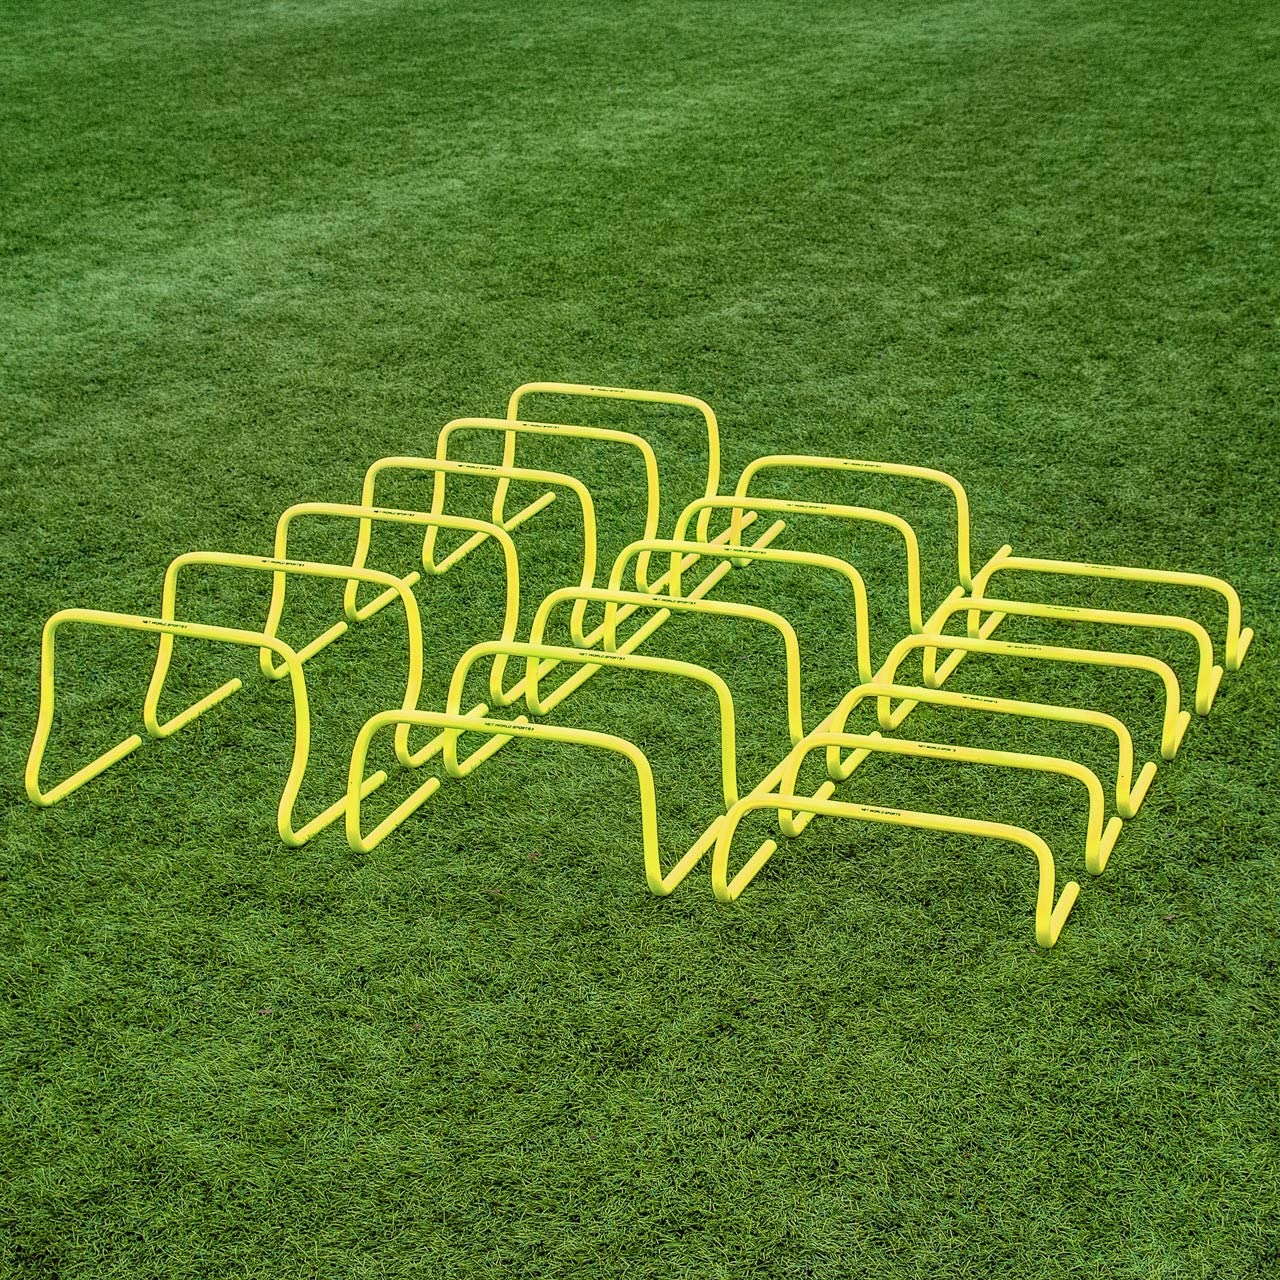 Speed Agility Training Hurdles 6 Pack Range of Sizes Net World Sports